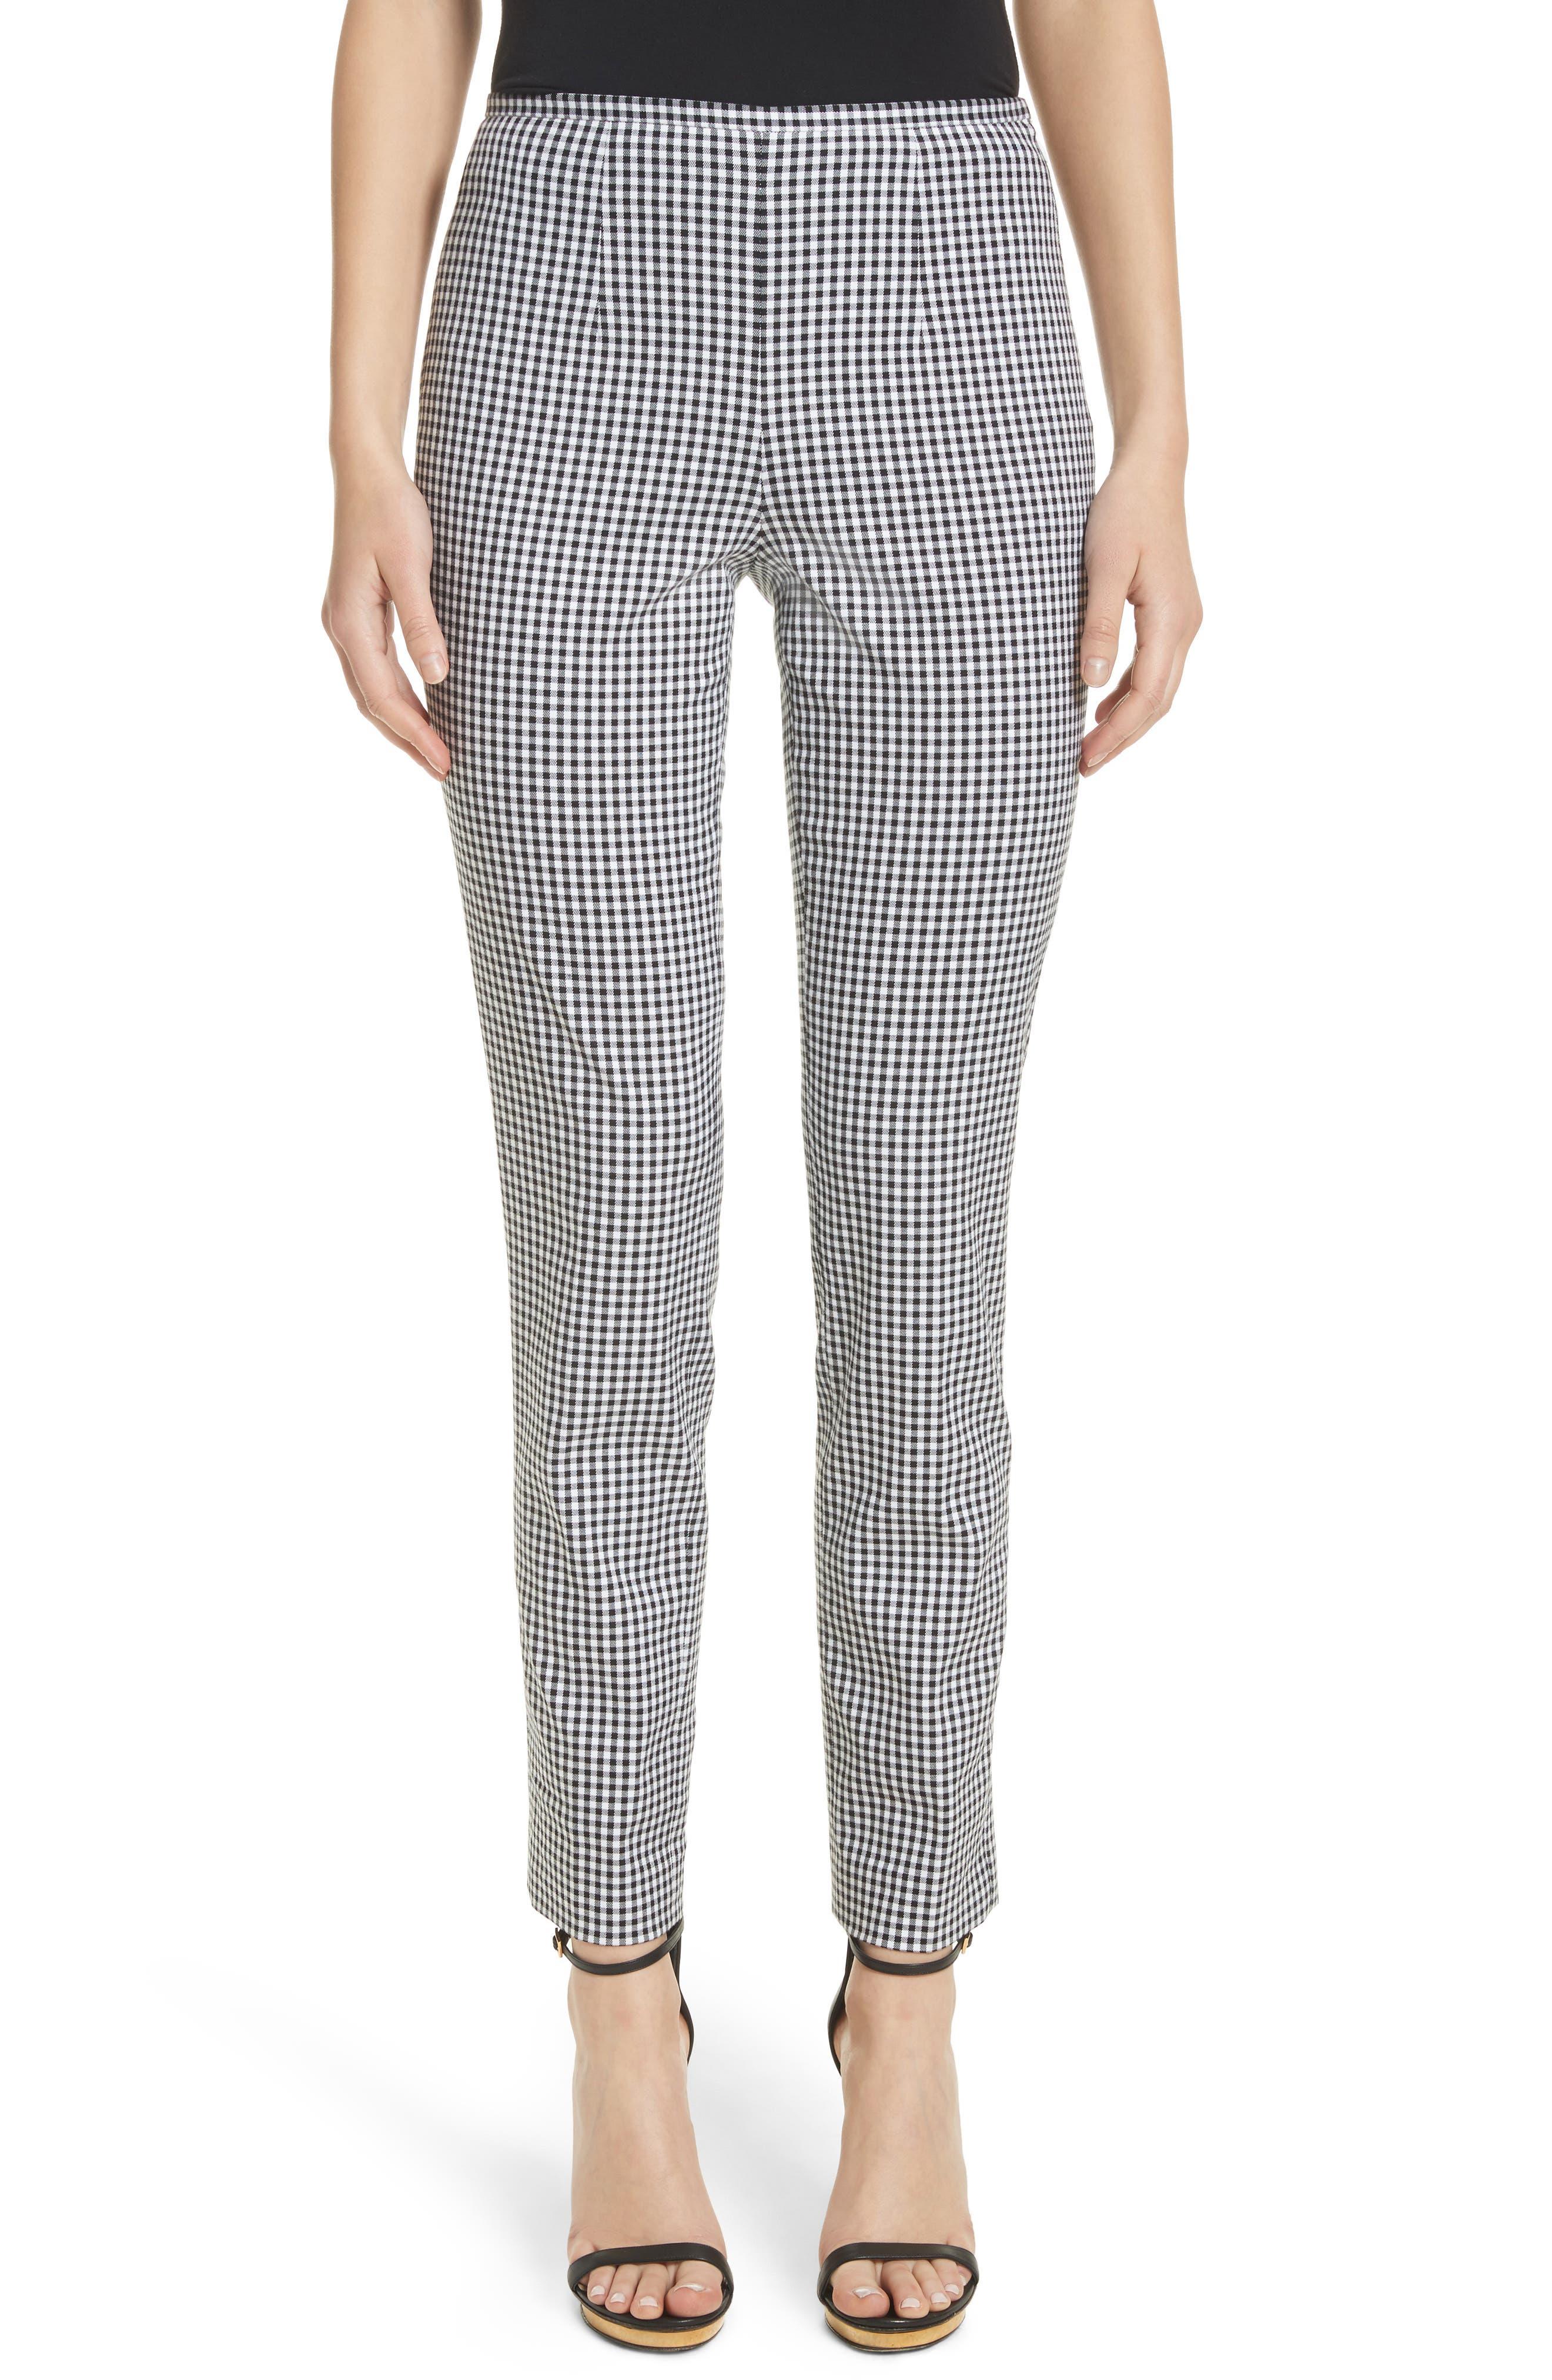 Gingham Stretch Cotton Pants,                             Main thumbnail 1, color,                             003